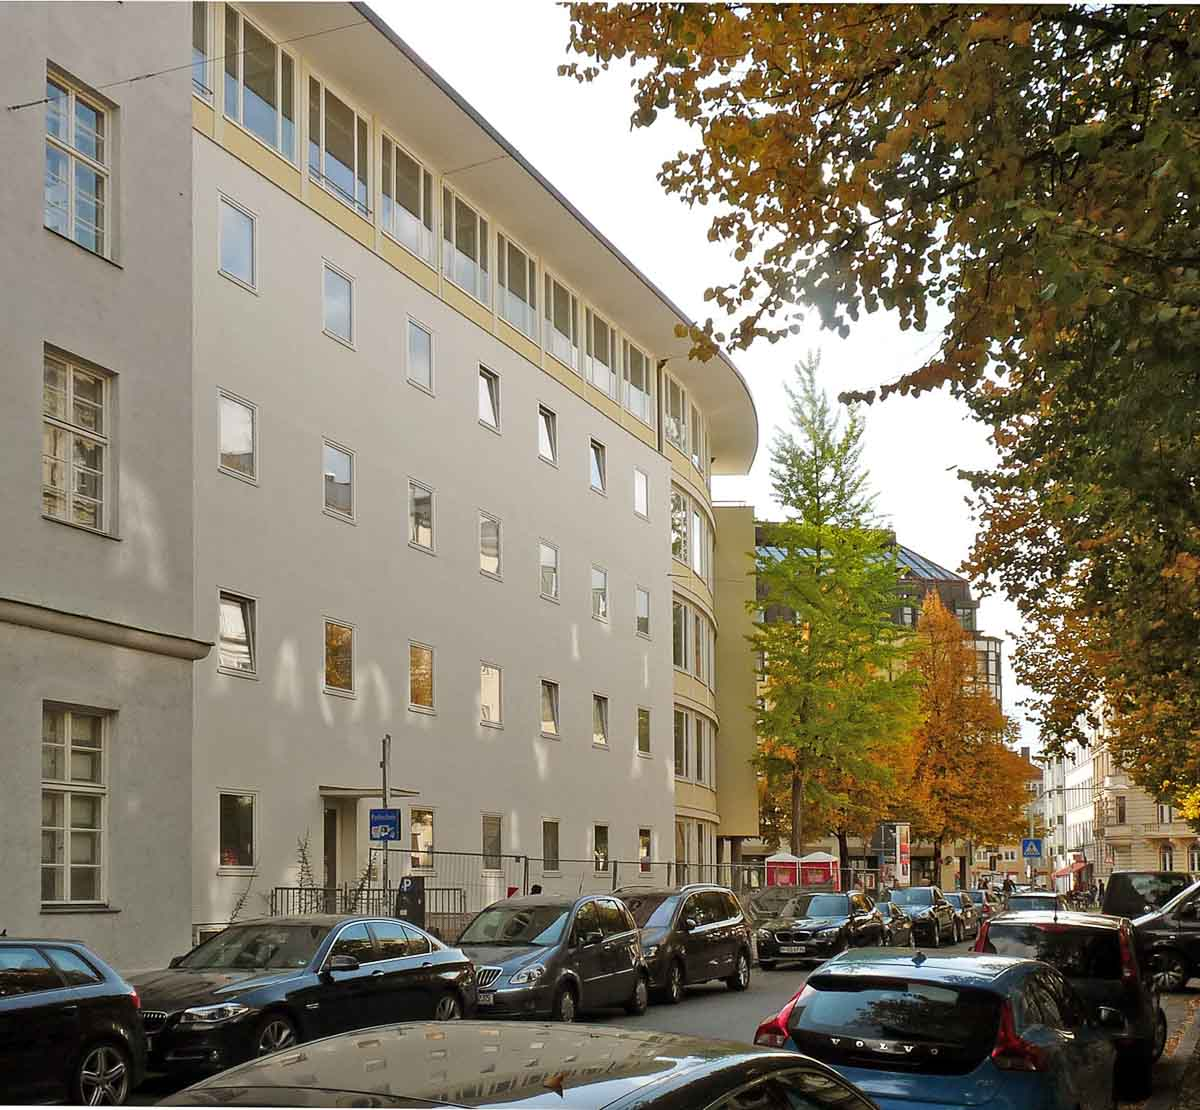 Architekturbuero-Stoetzel-Stumborg-Muenchen-Grundschule-St-Anna-Str-3